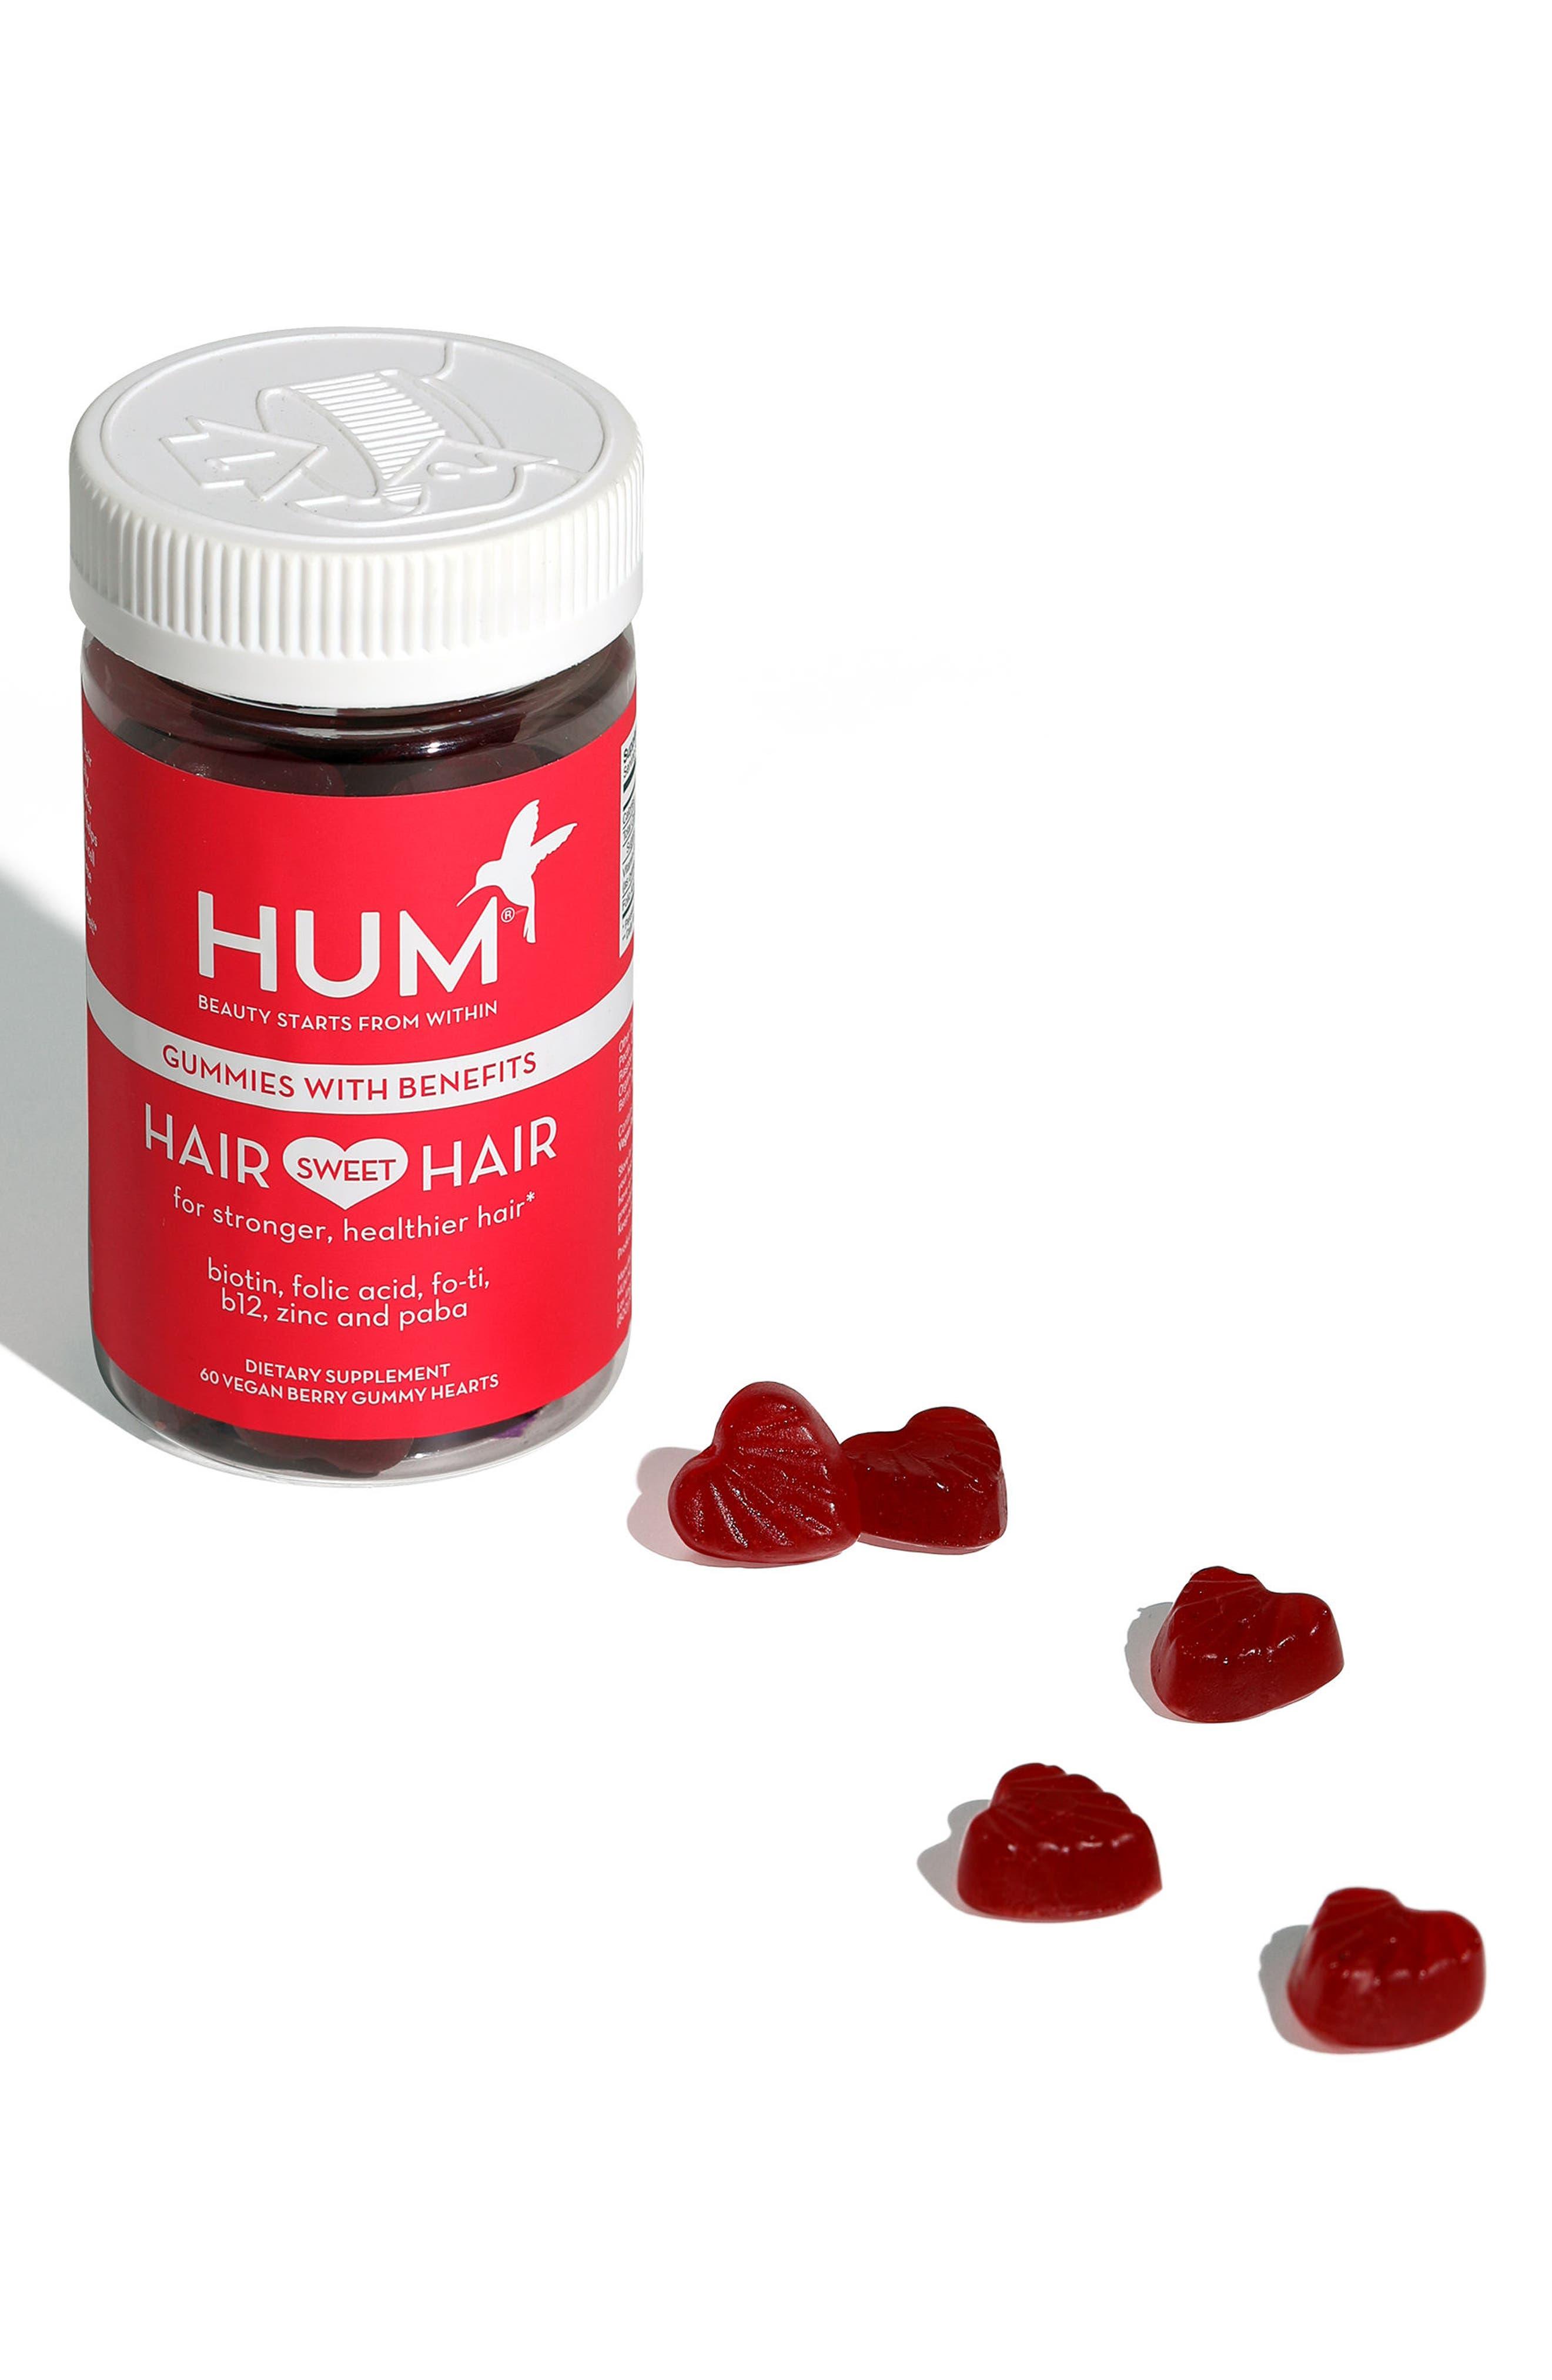 Hair Sweet Hair Gummies Supplement for Healthy Hair,                             Alternate thumbnail 5, color,                             NO COLOR